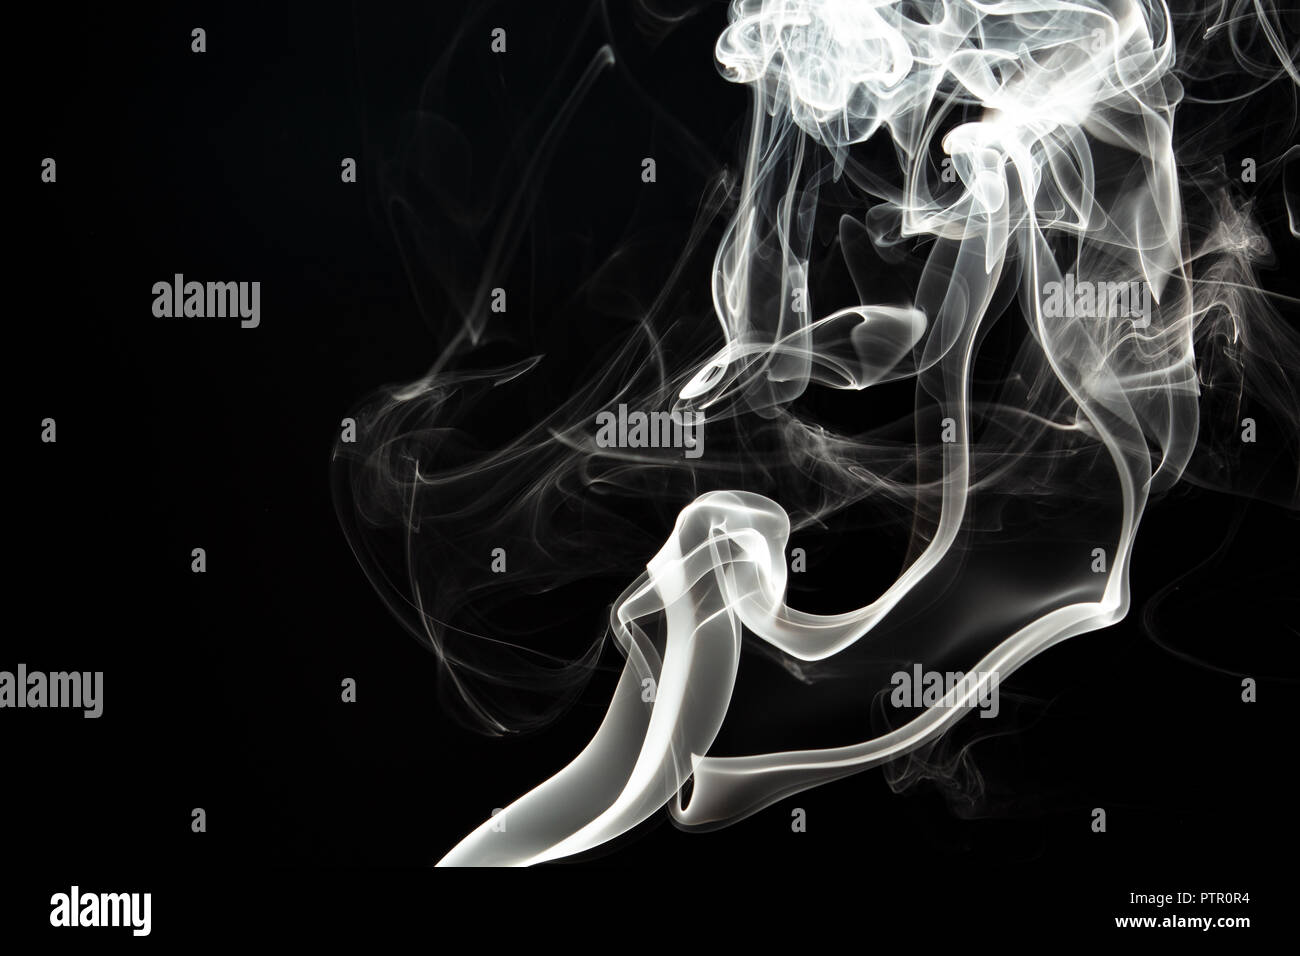 Rauch, Rauch, Qualm Stockbild